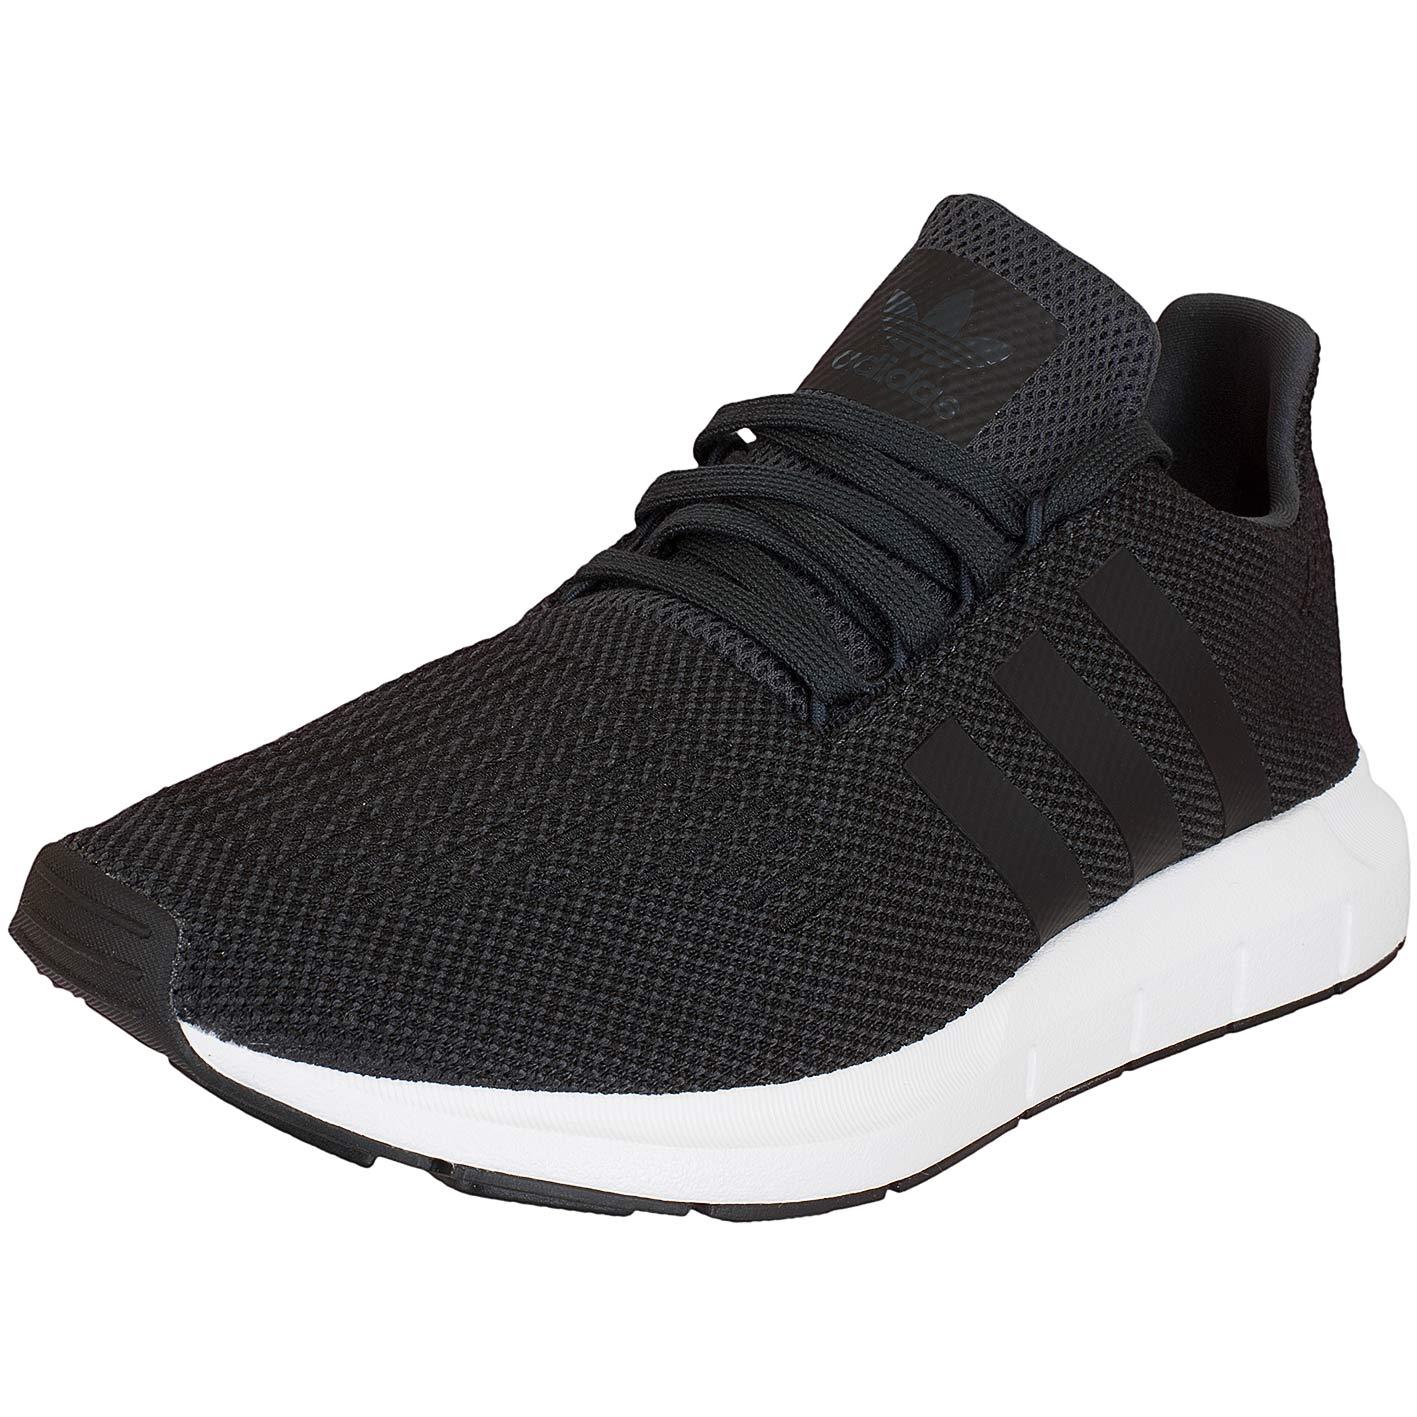 ☆ Adidas Originals Sneaker Swift Run carbonschwarz hier